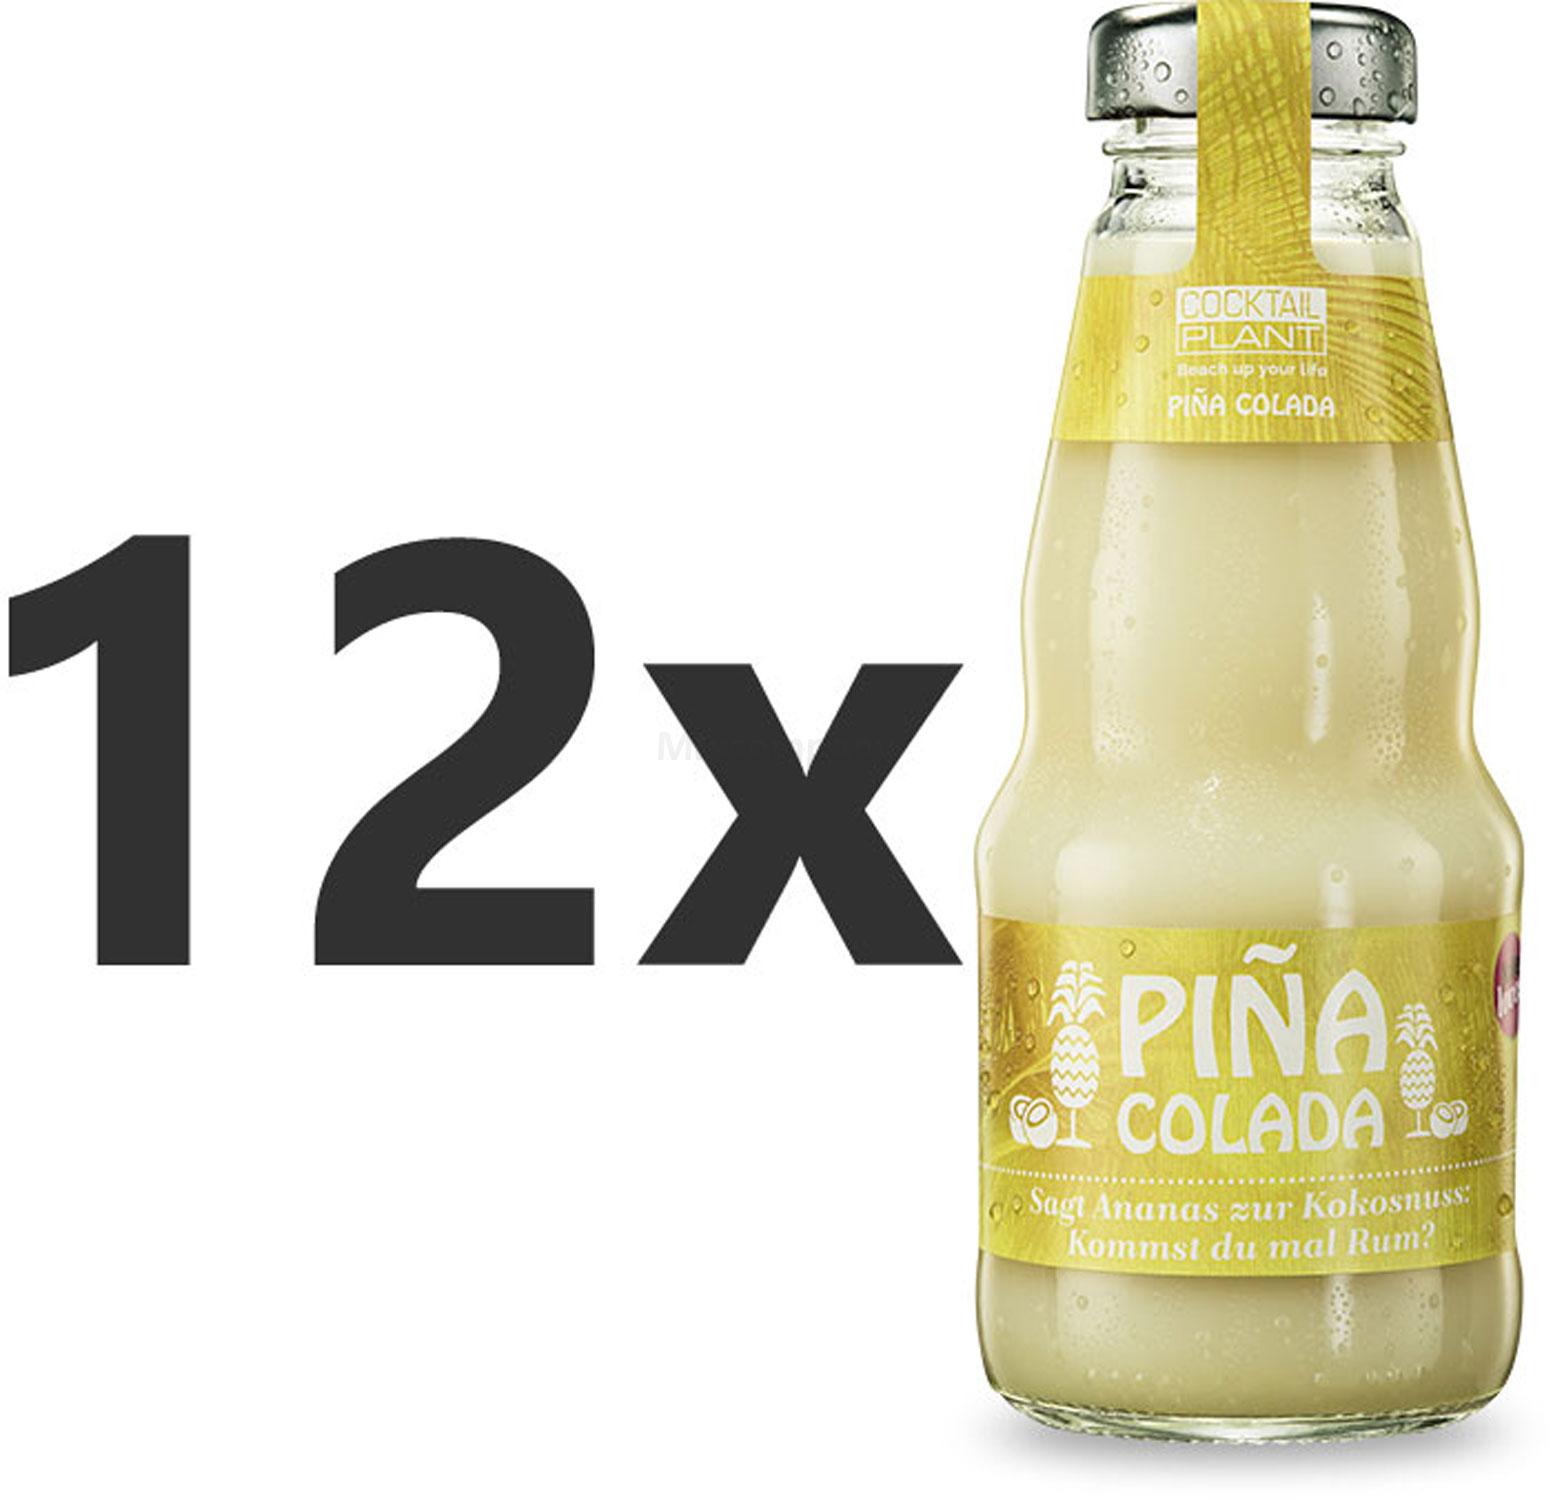 Cocktail Plant Pina Colada (10,1% Vol) 12x 0,2l = 2,4l - inkl. Pfand MEHRWEG - [Enthält Sulfite]